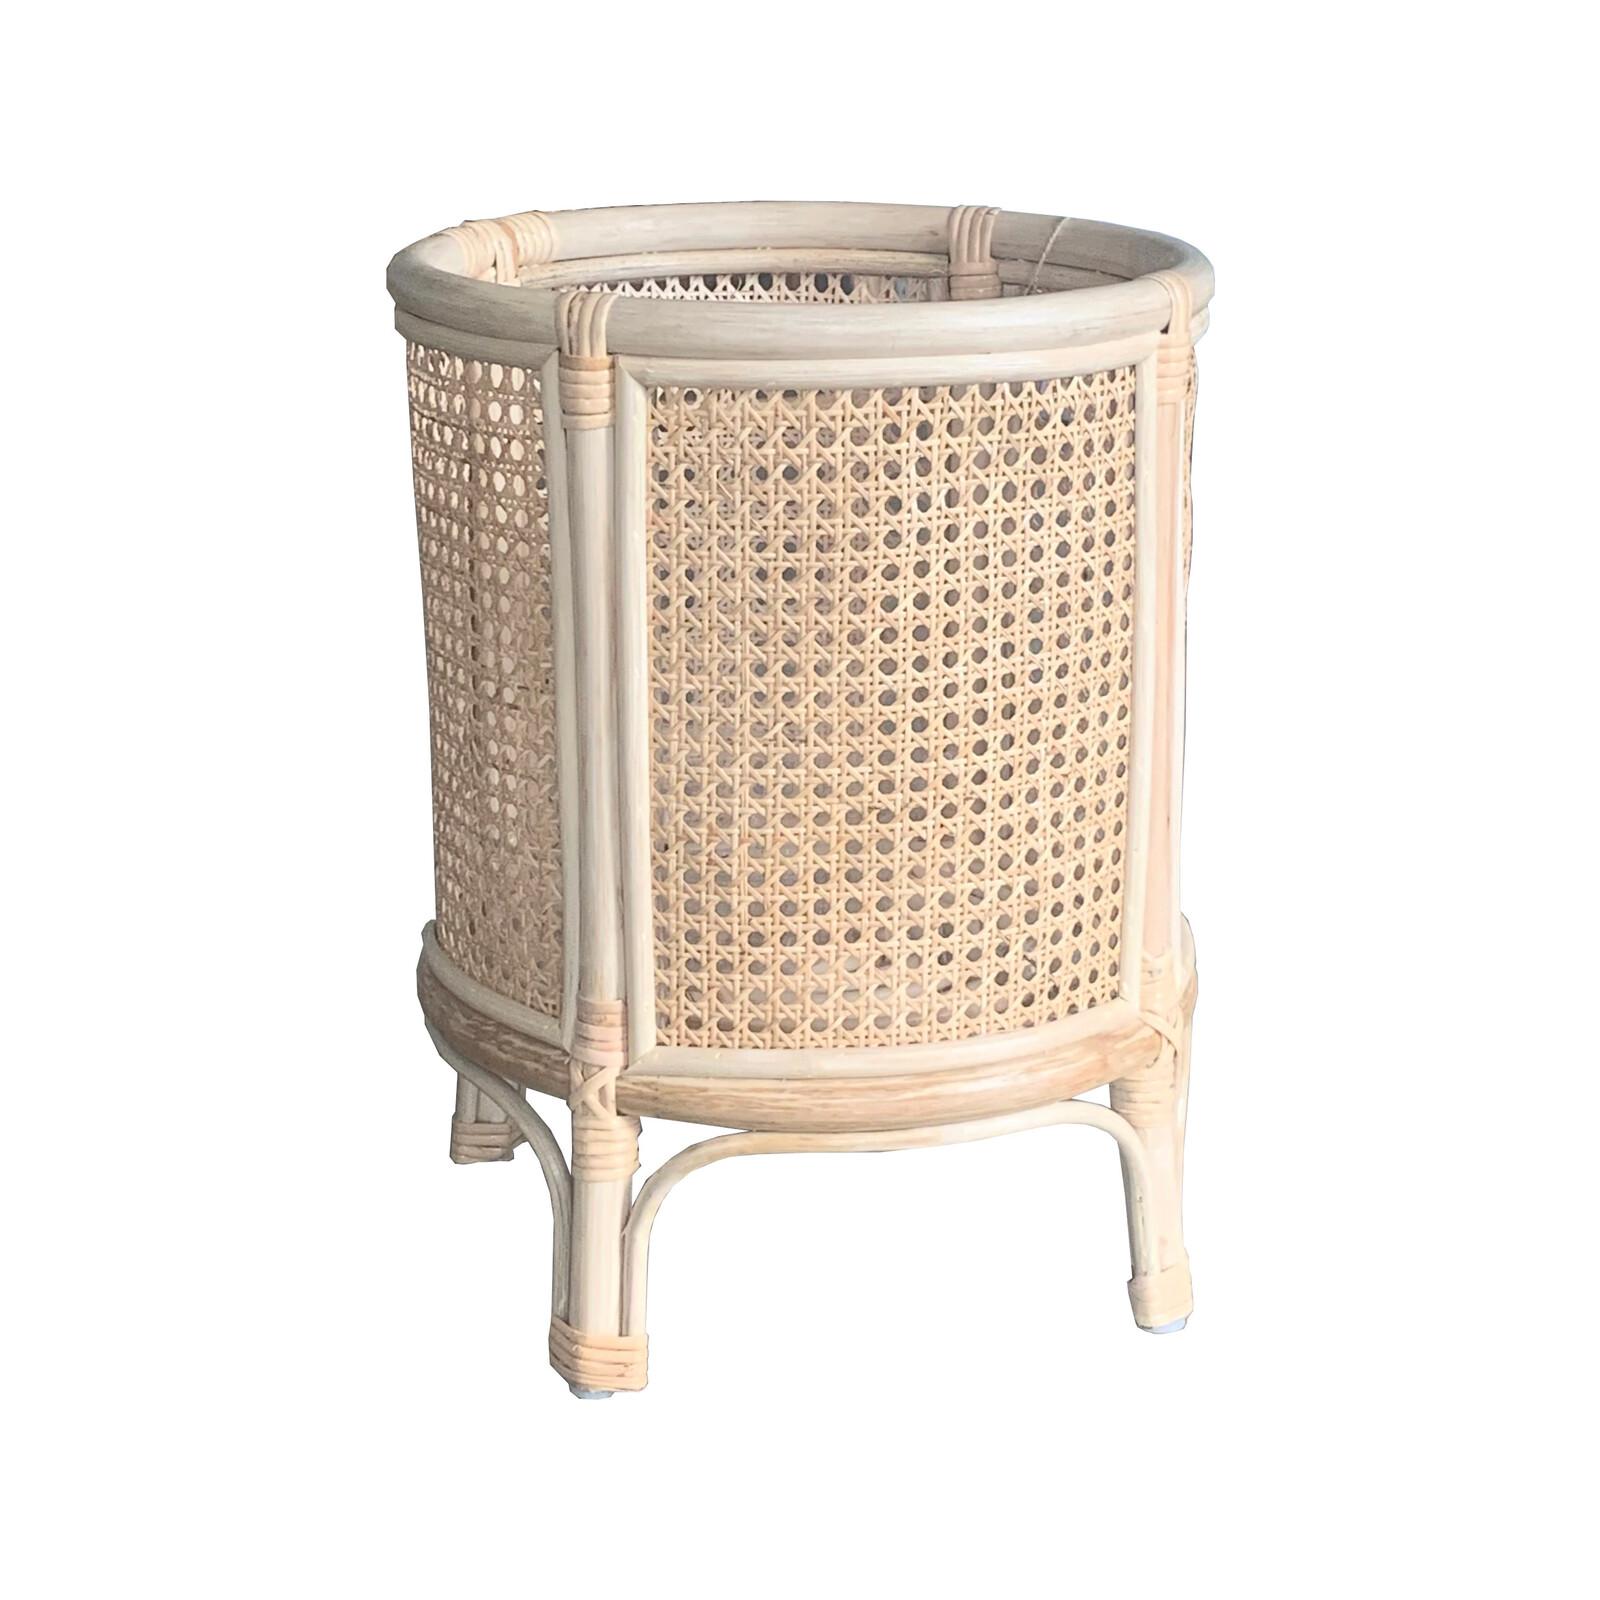 Home Bazar Basket 36x47cm Rattan Round Malibu